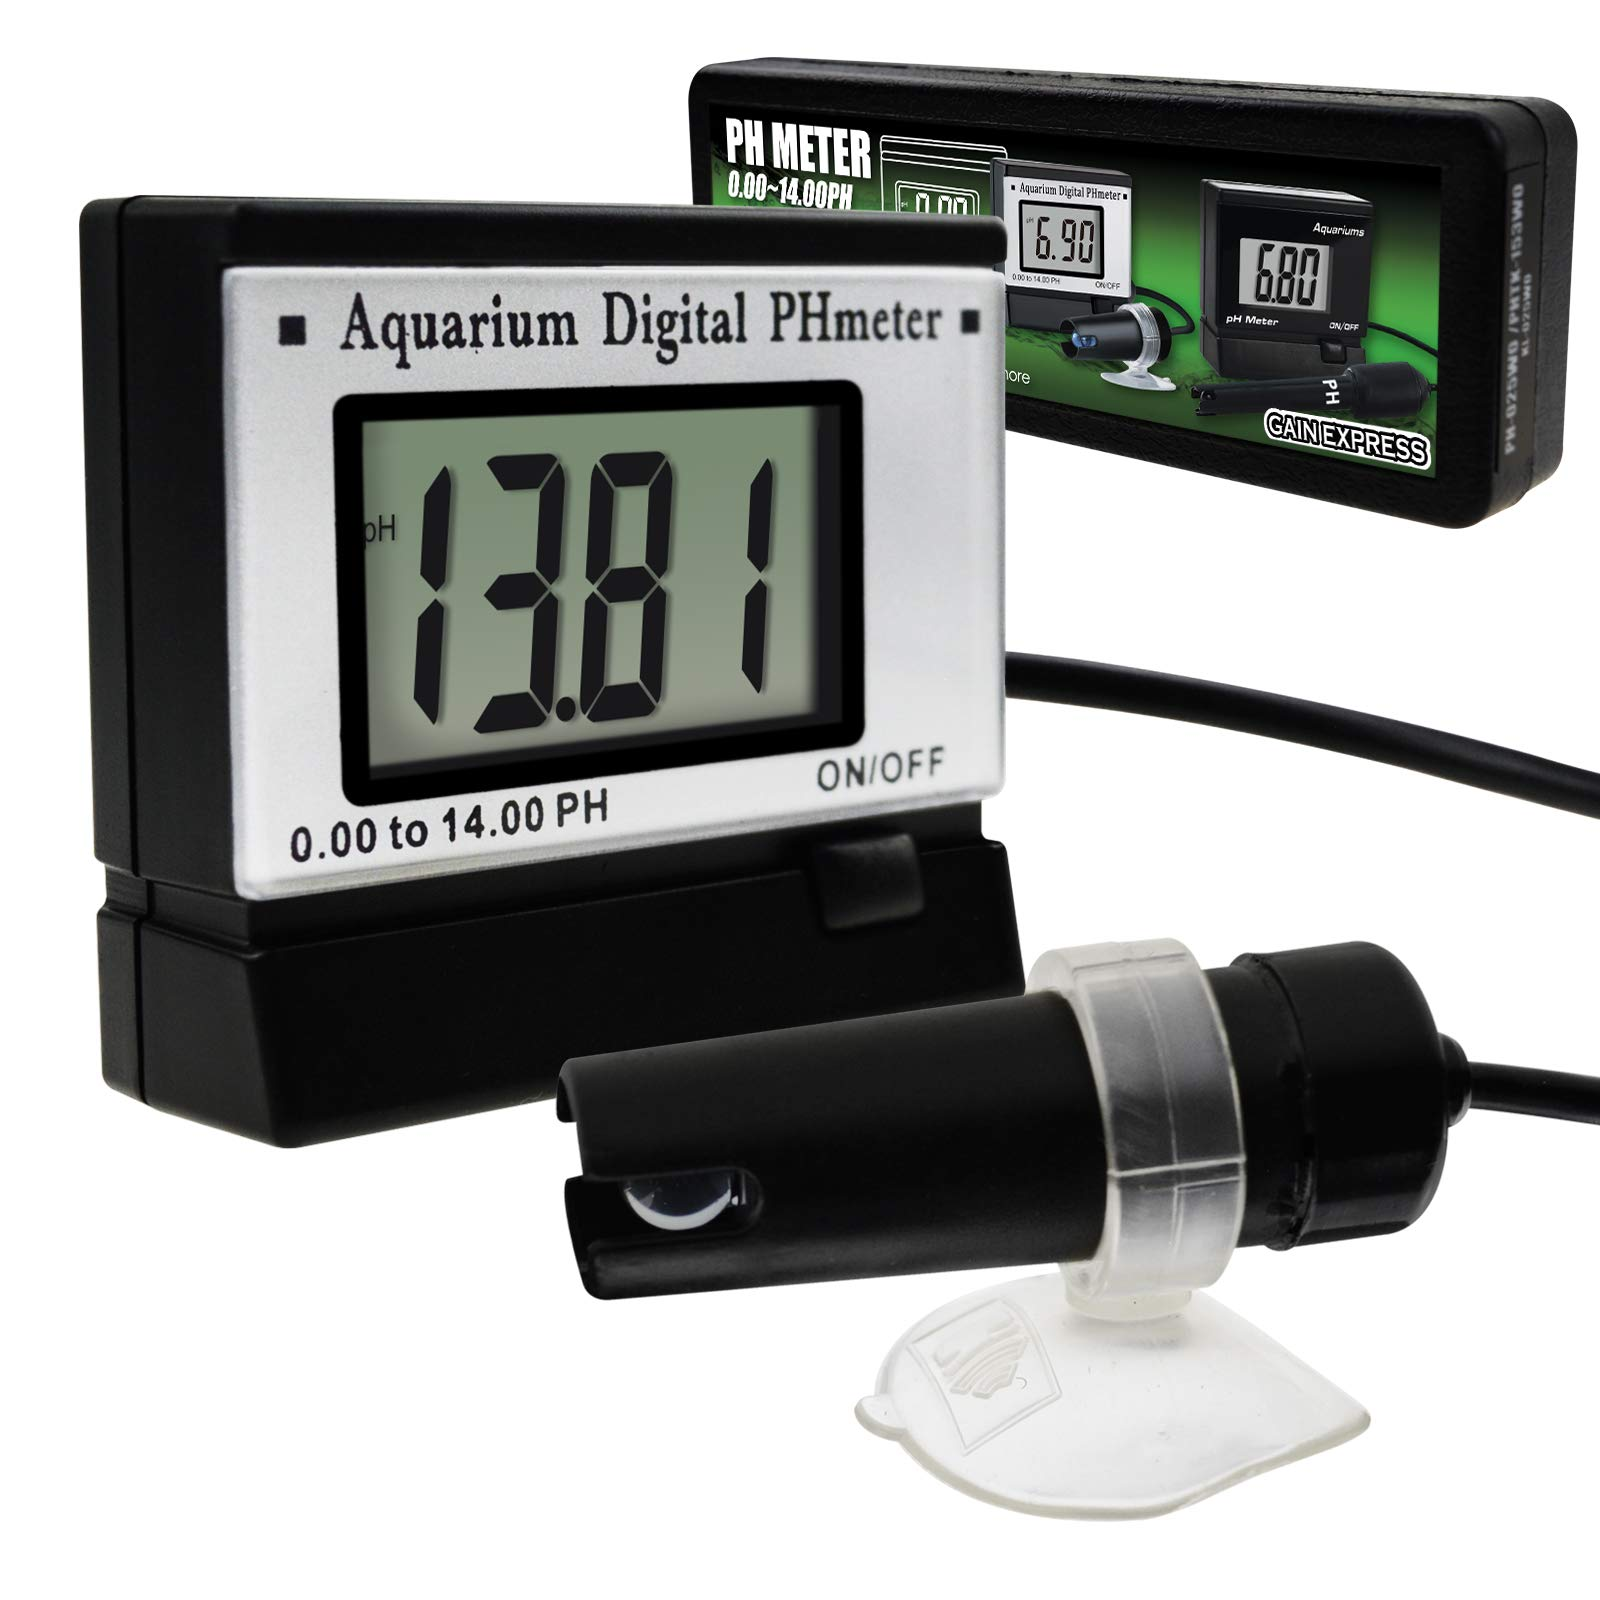 Digital pH Monitor Meter ATC 0.00~14.00pH w/ Power Adaptor & 1.5M Long Electrode Probe, Continuous Water Quality Monitoring Tester Kit Aquarium Hydroponics Spa Tank Pool Laboratories Portable